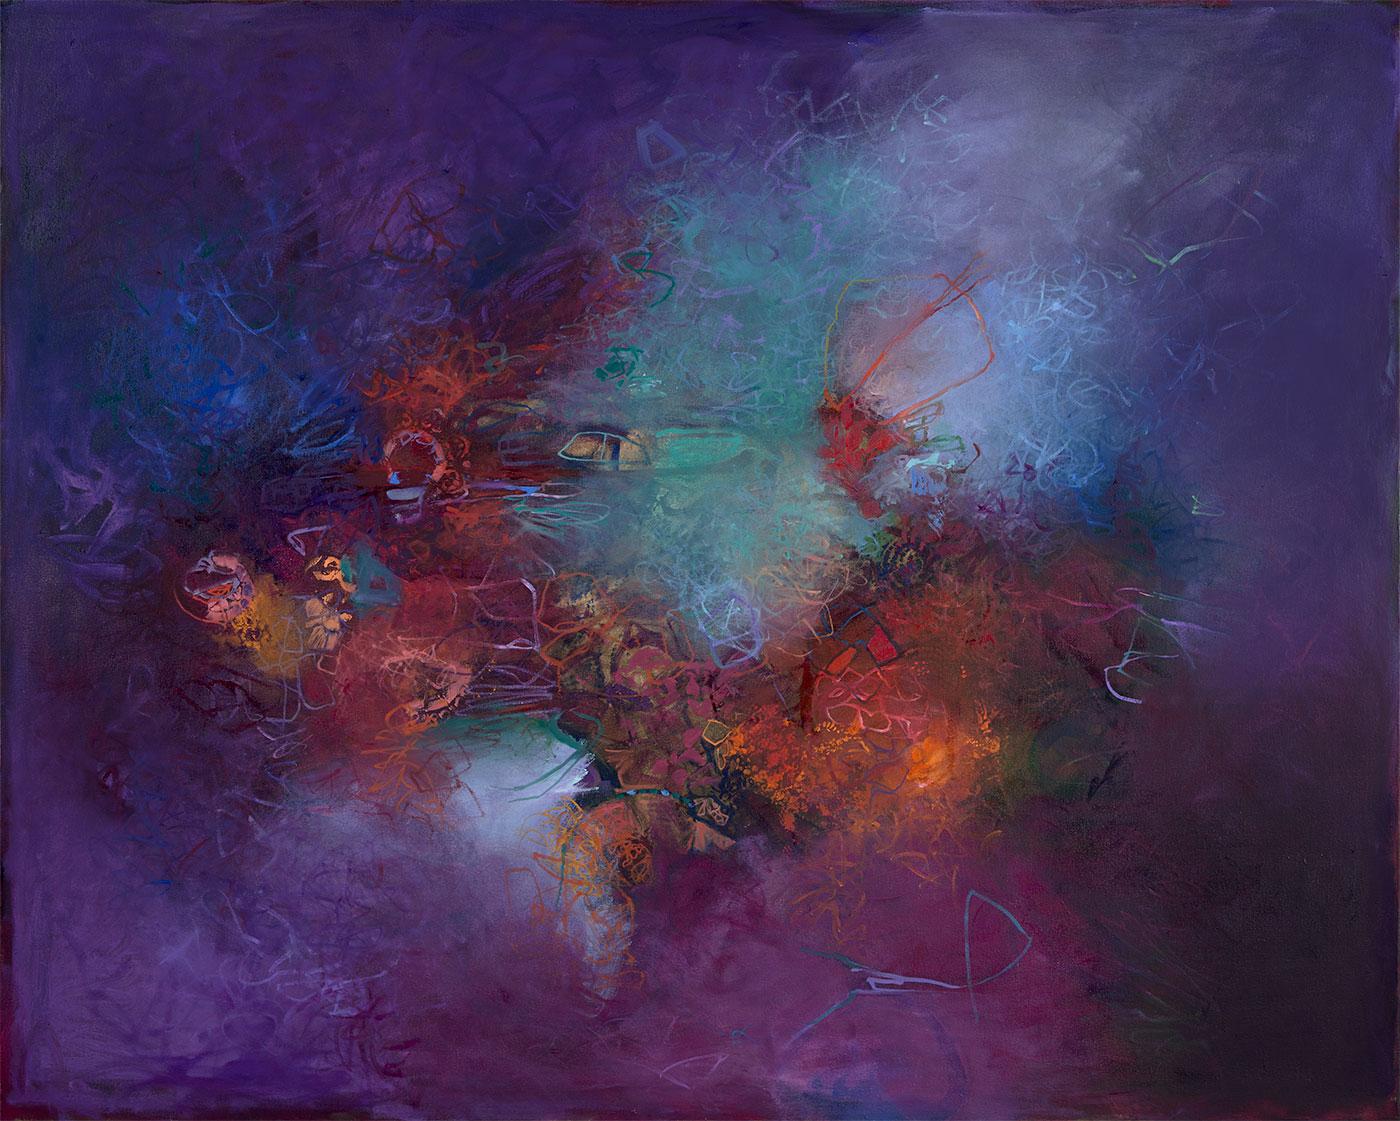 """Asterisms"", 48 x 60 inches, 2019 b"